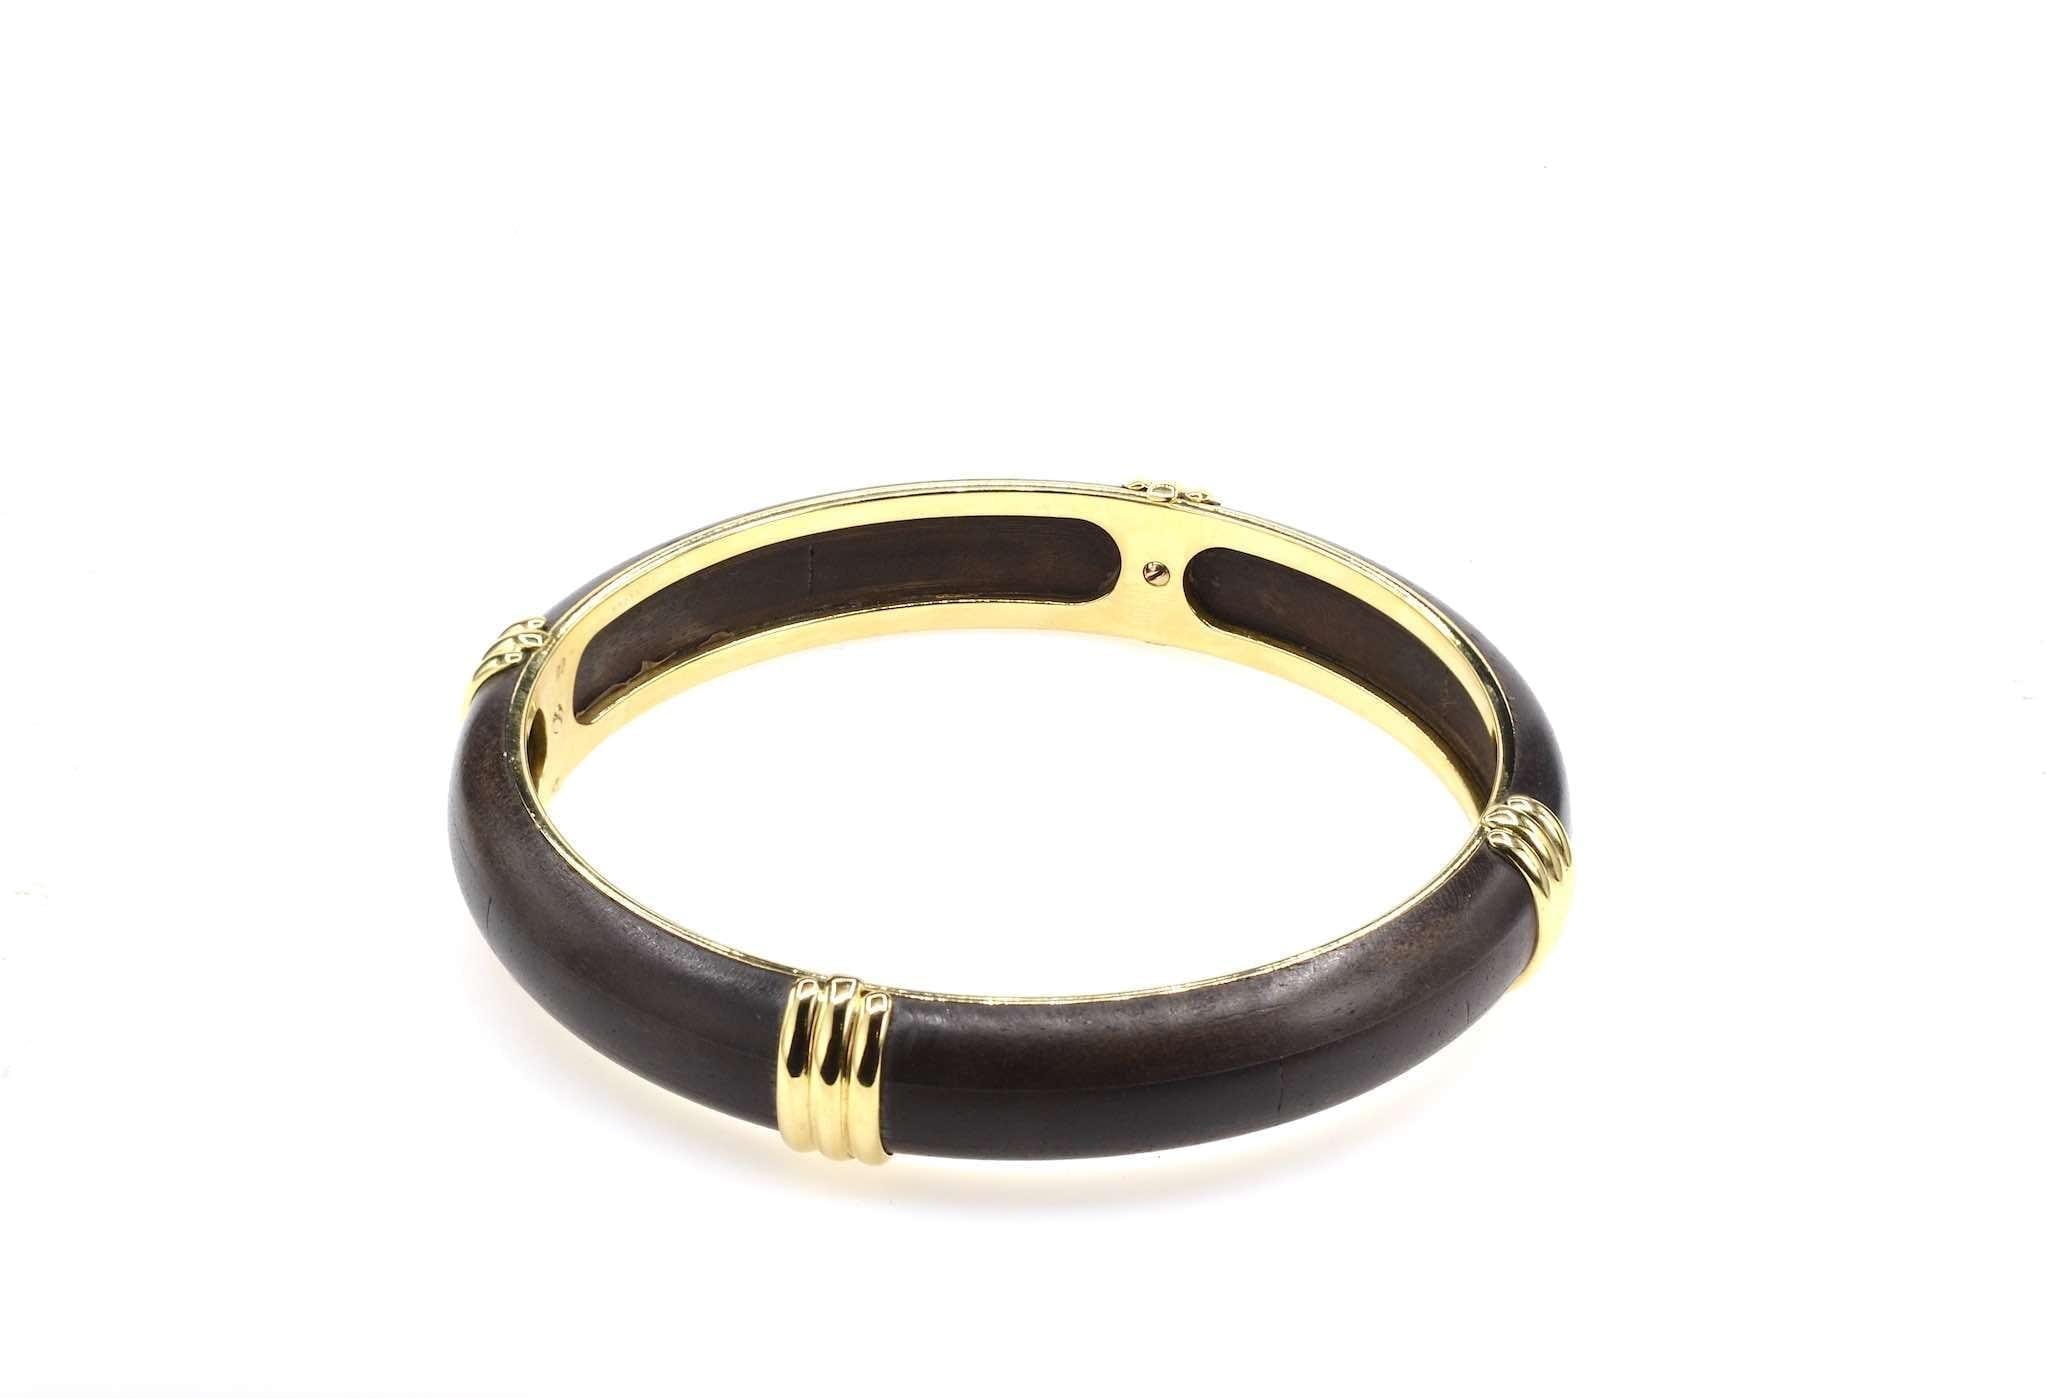 Bracelet Boucheron en or 18k et bois